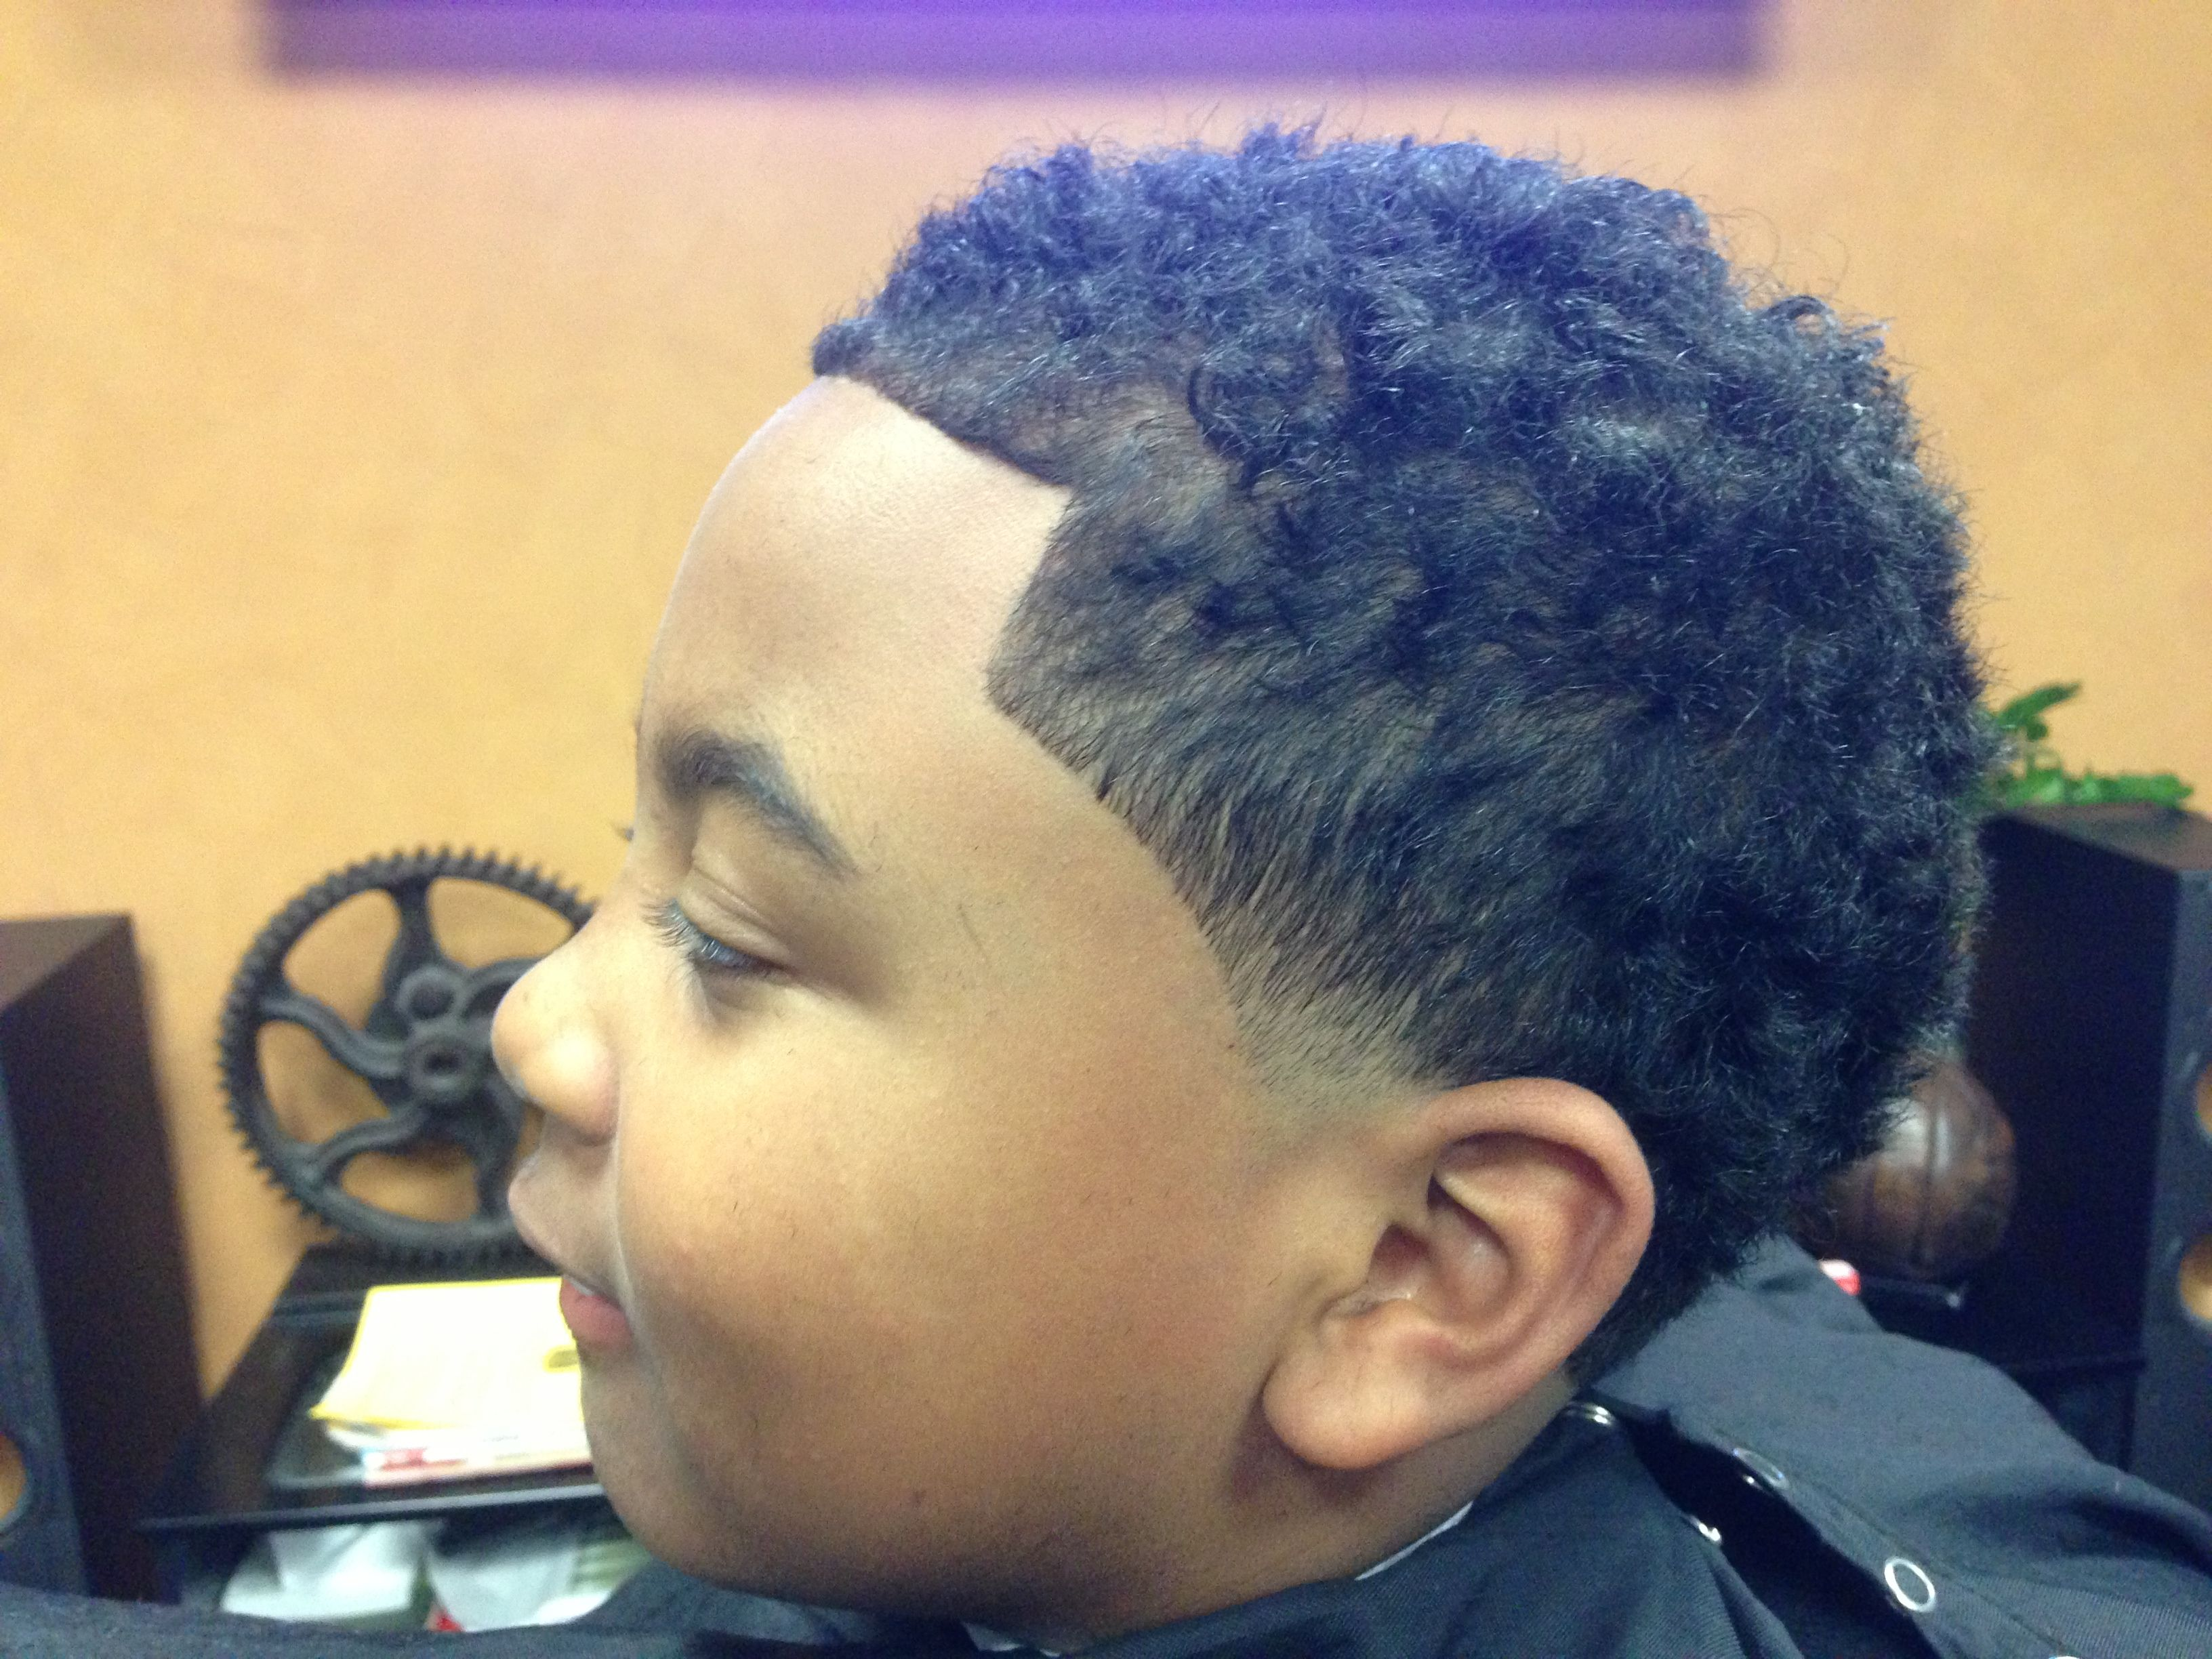 Pin on Hair-Cuts